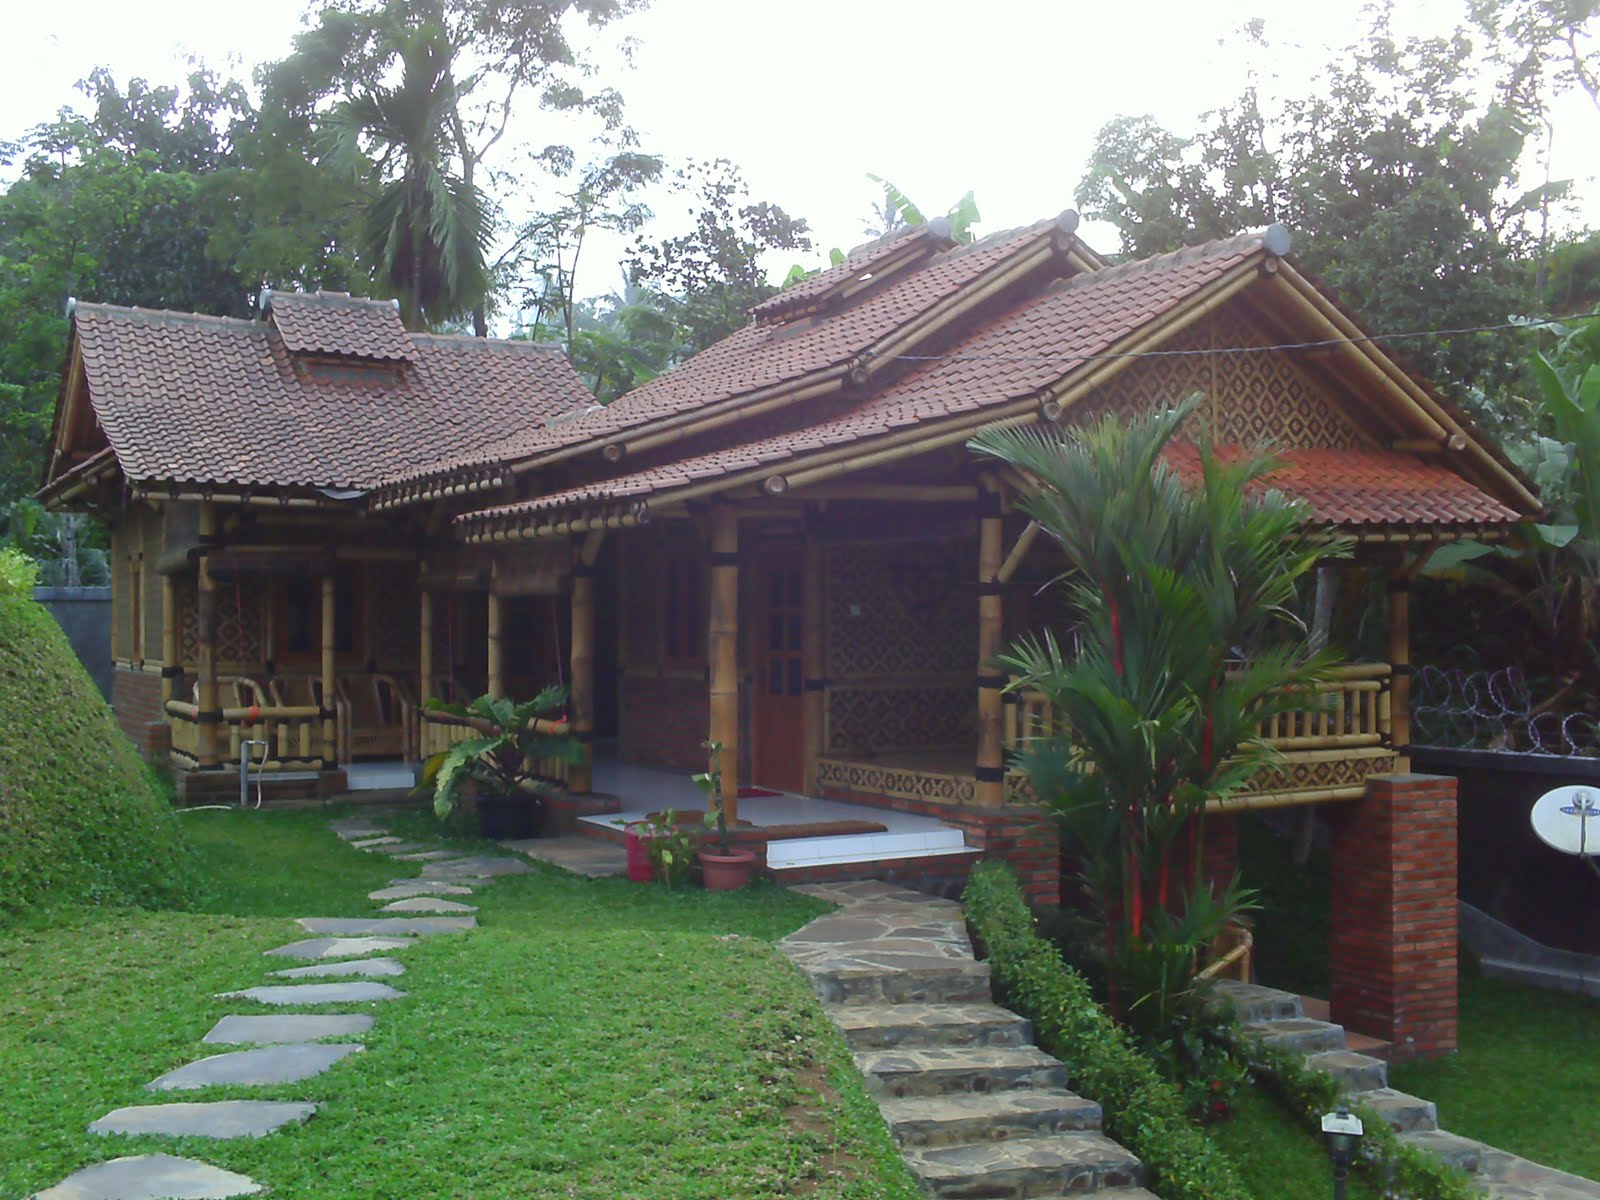 green arsitektur dengan rumah bambu - bangun artha sarana insan